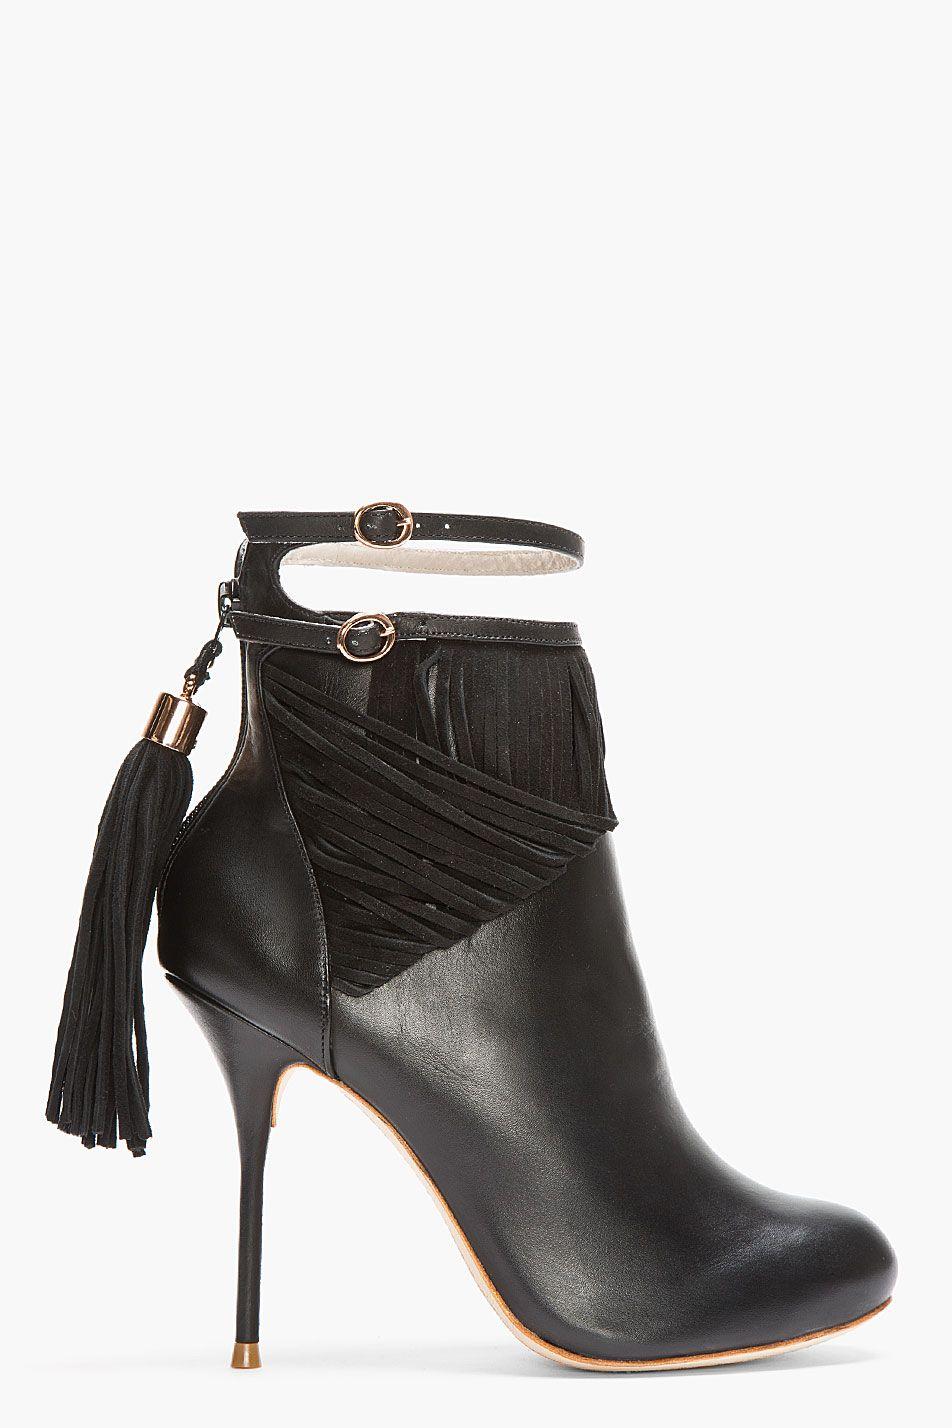 SOPHIA WEBSTER Black Leather TAsseled Kendall Ankle Boots  c6a38b8bd40